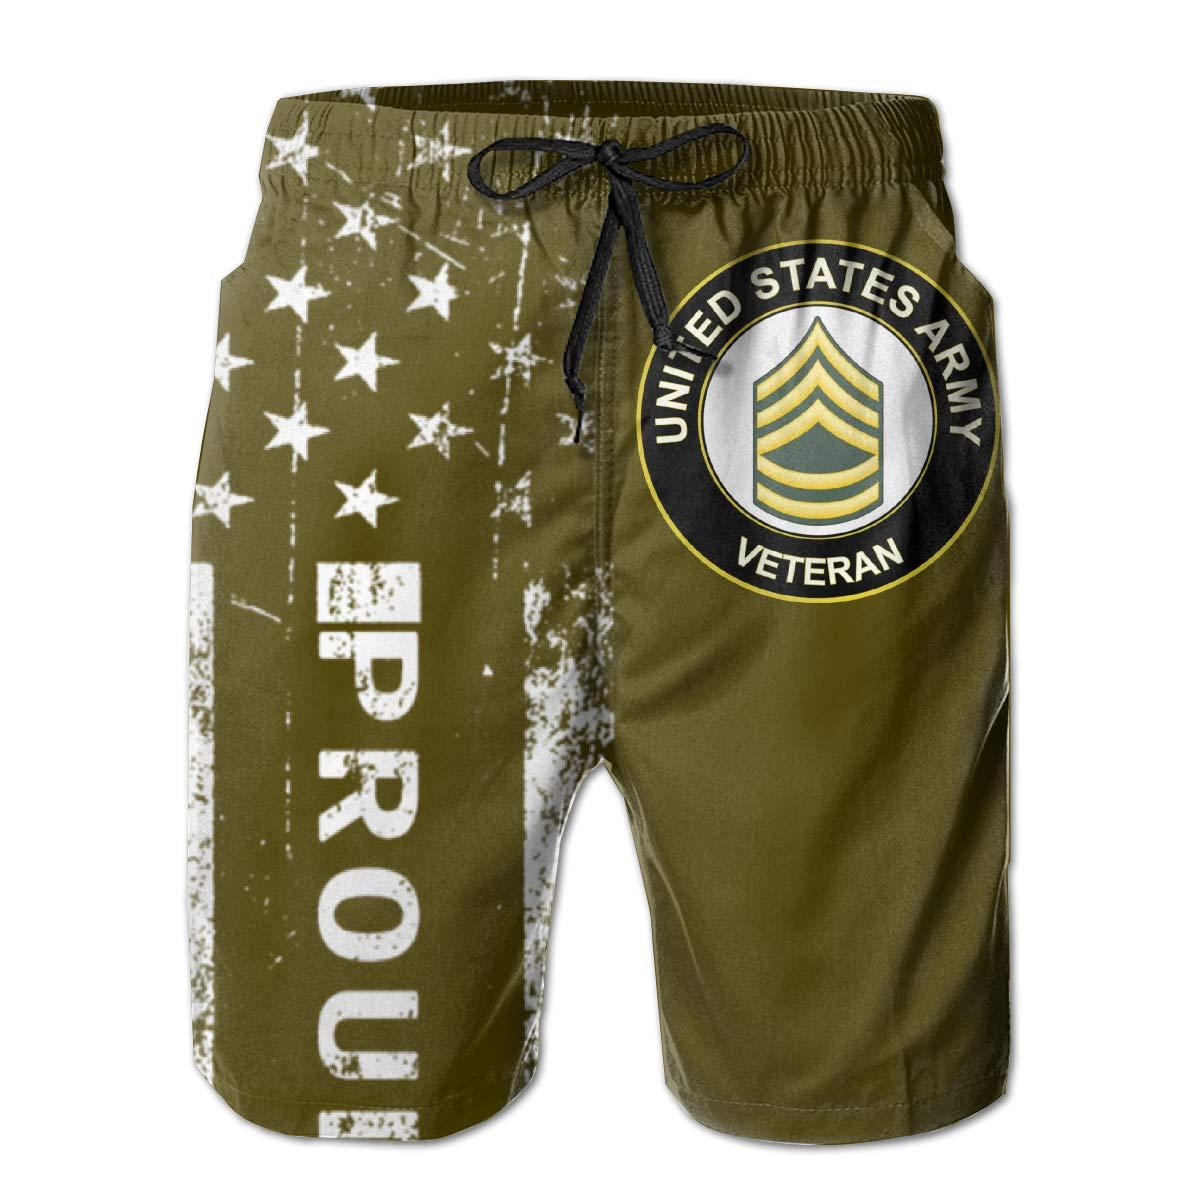 SUNSUNNY US Army Sergeant First Class Veteran Mens Boardshorts Swim Trunks Beach Athletic Shorts